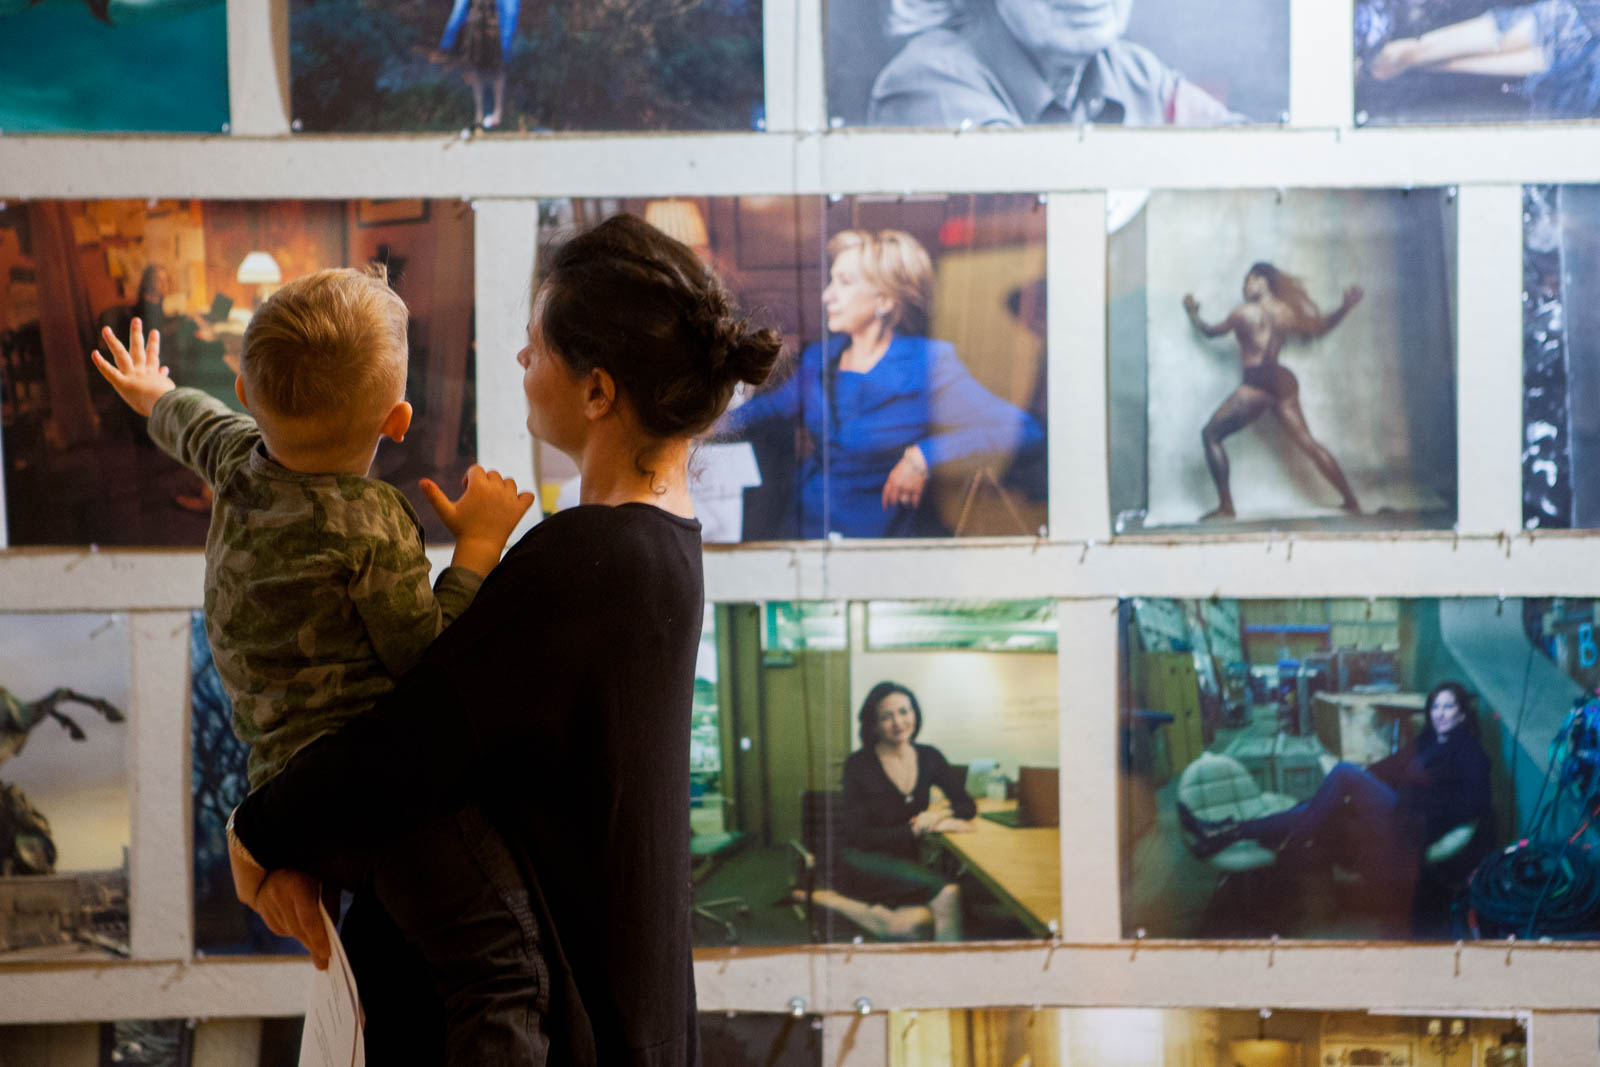 annie-leibovitz-women-new-portraits-robertiaga-19